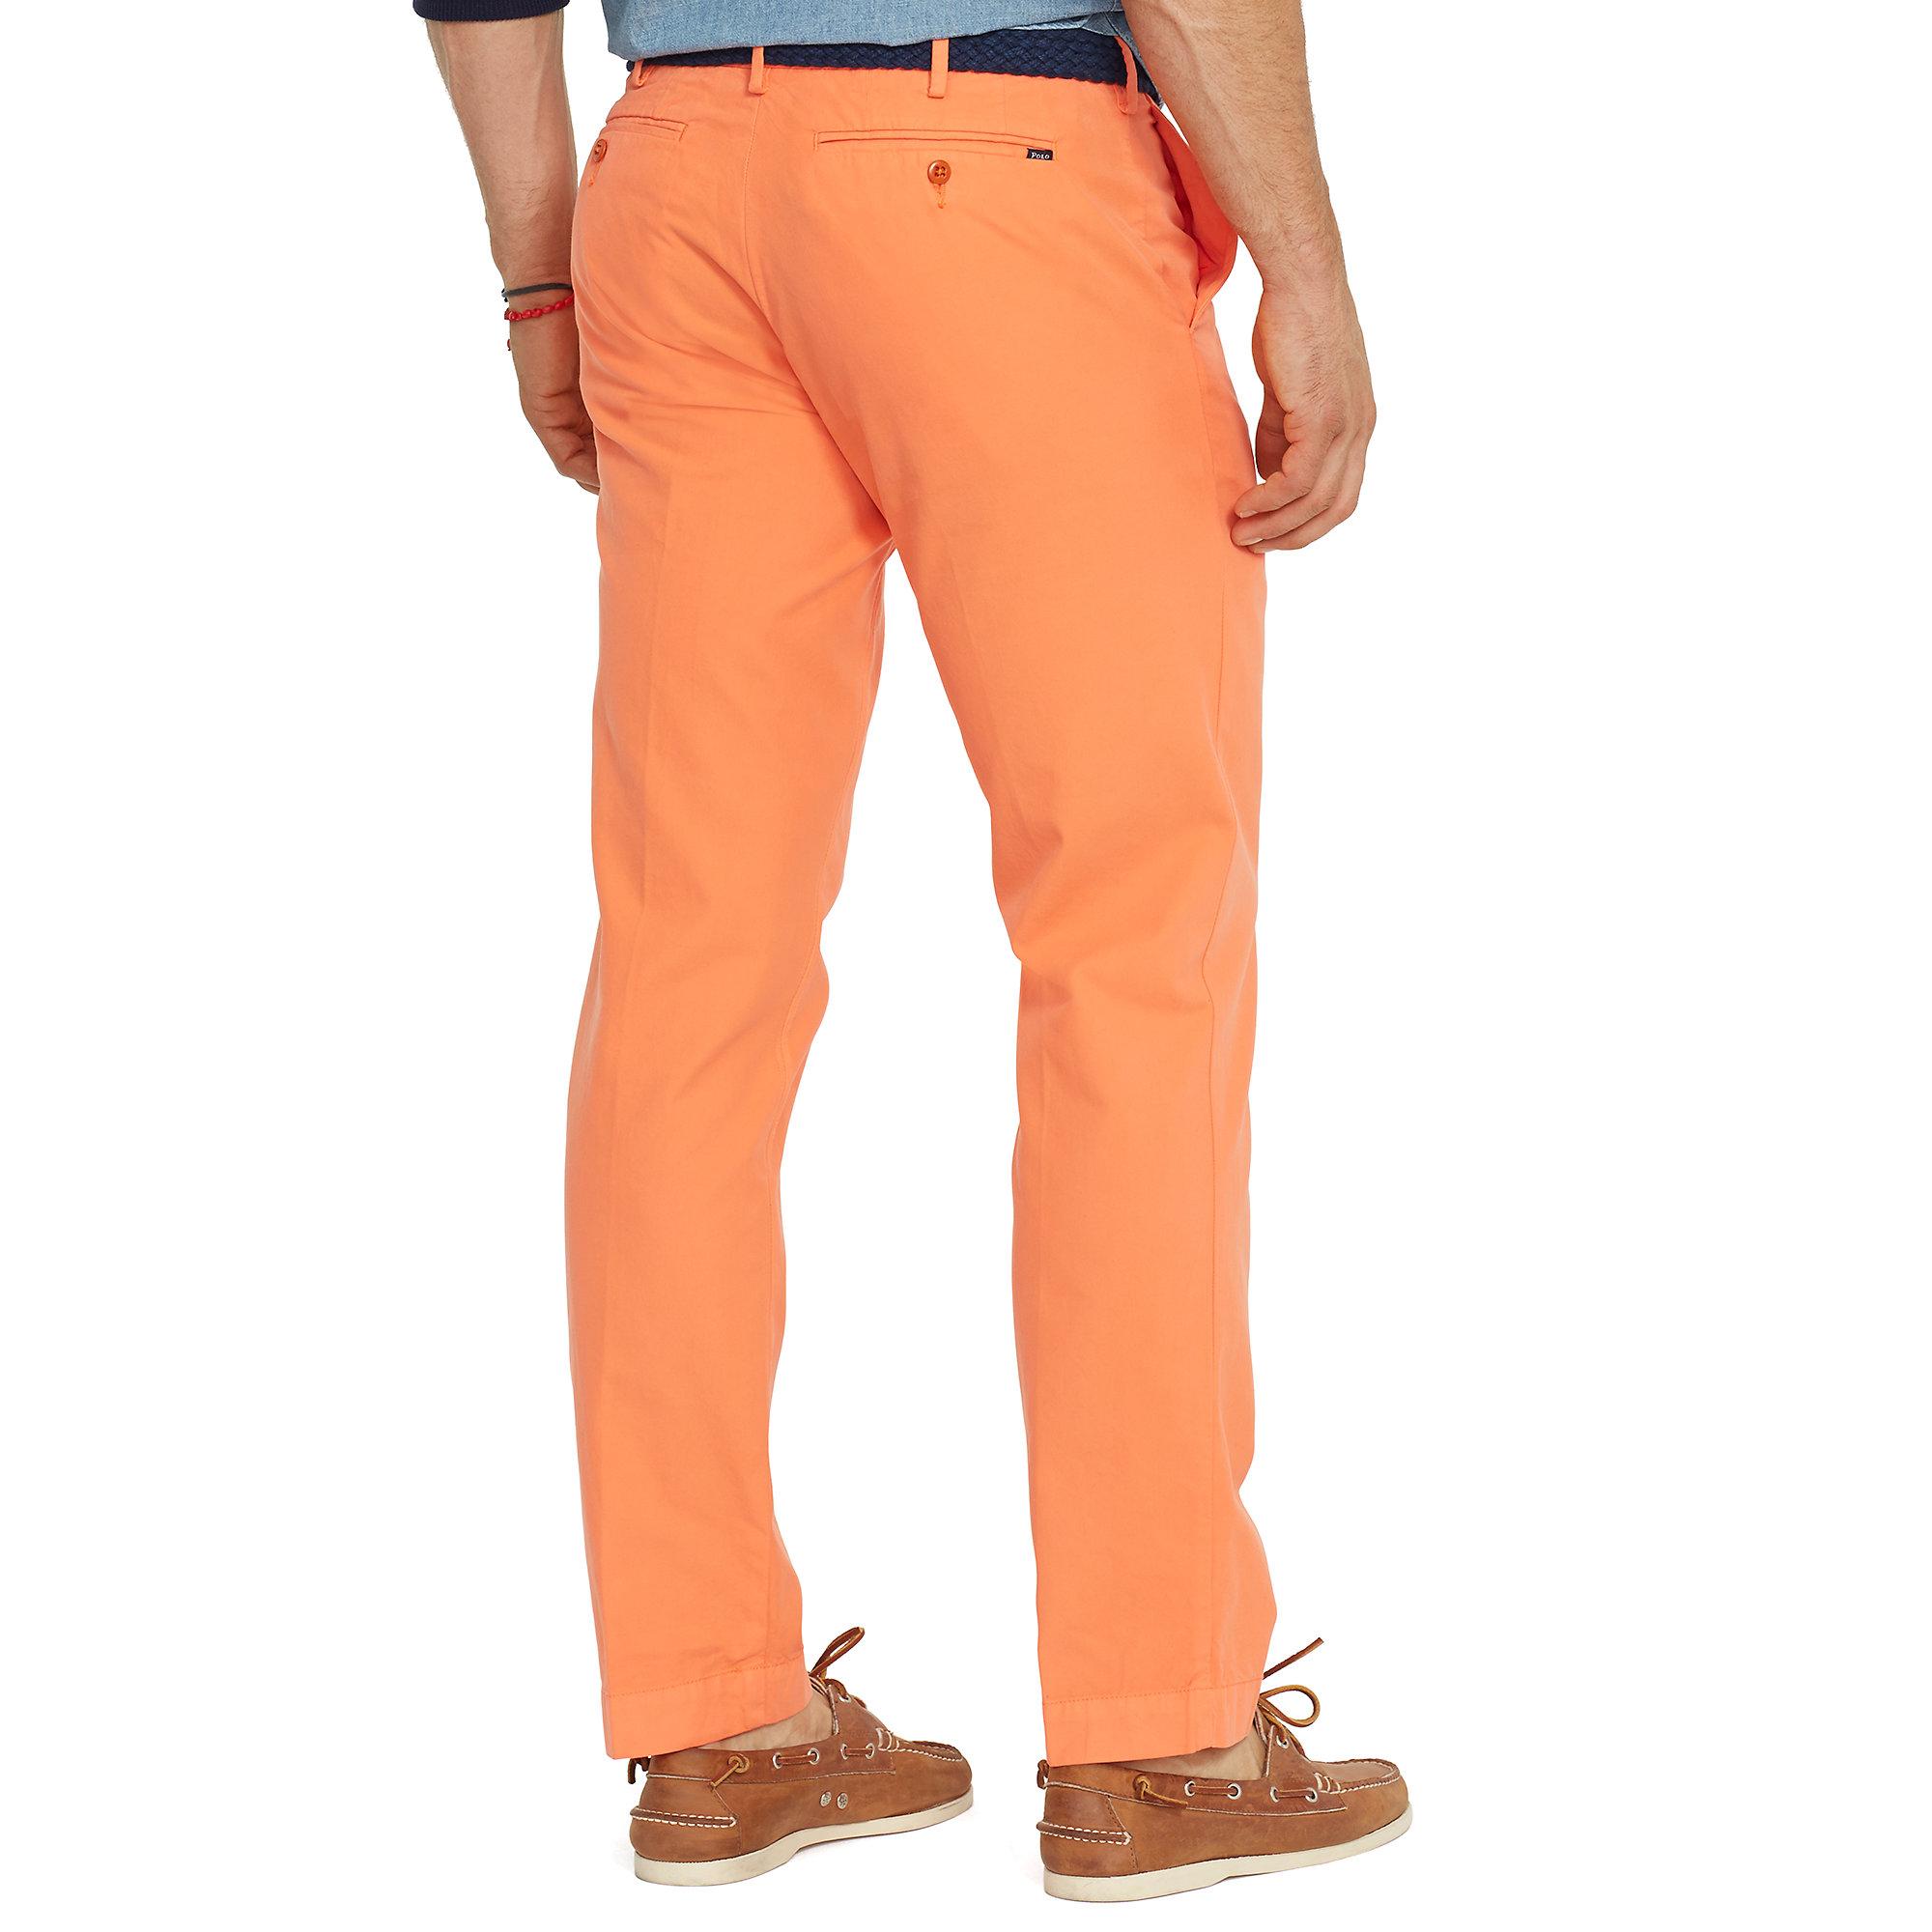 ralph lauren slim fit pima cotton chino in orange for men. Black Bedroom Furniture Sets. Home Design Ideas